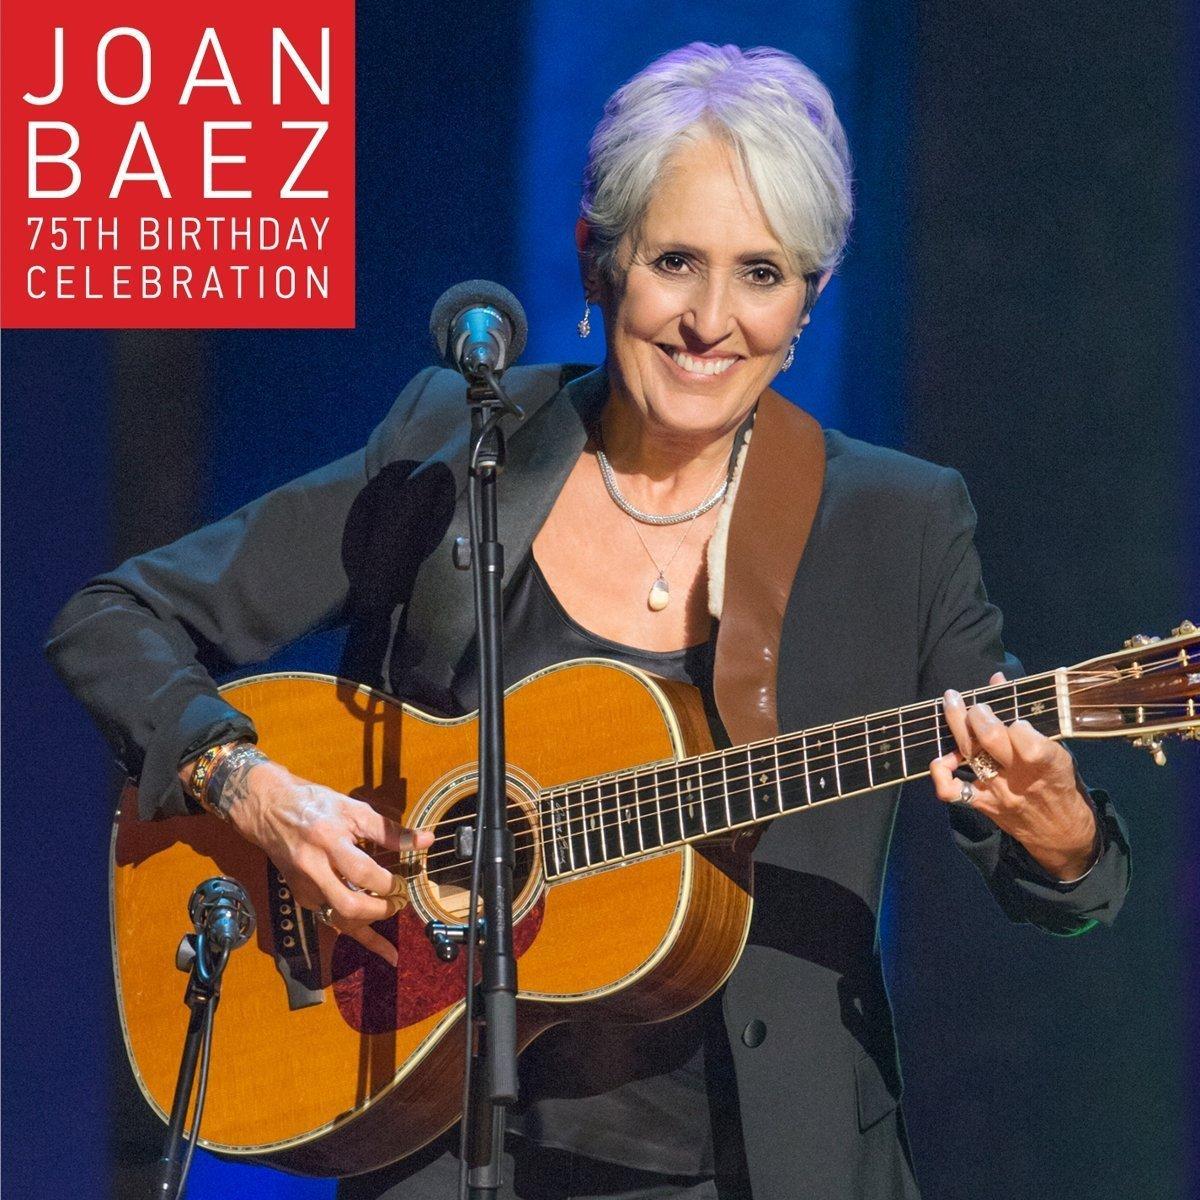 Joan Baez 75th Birthday Celebration (2 CD/DVD Combo)